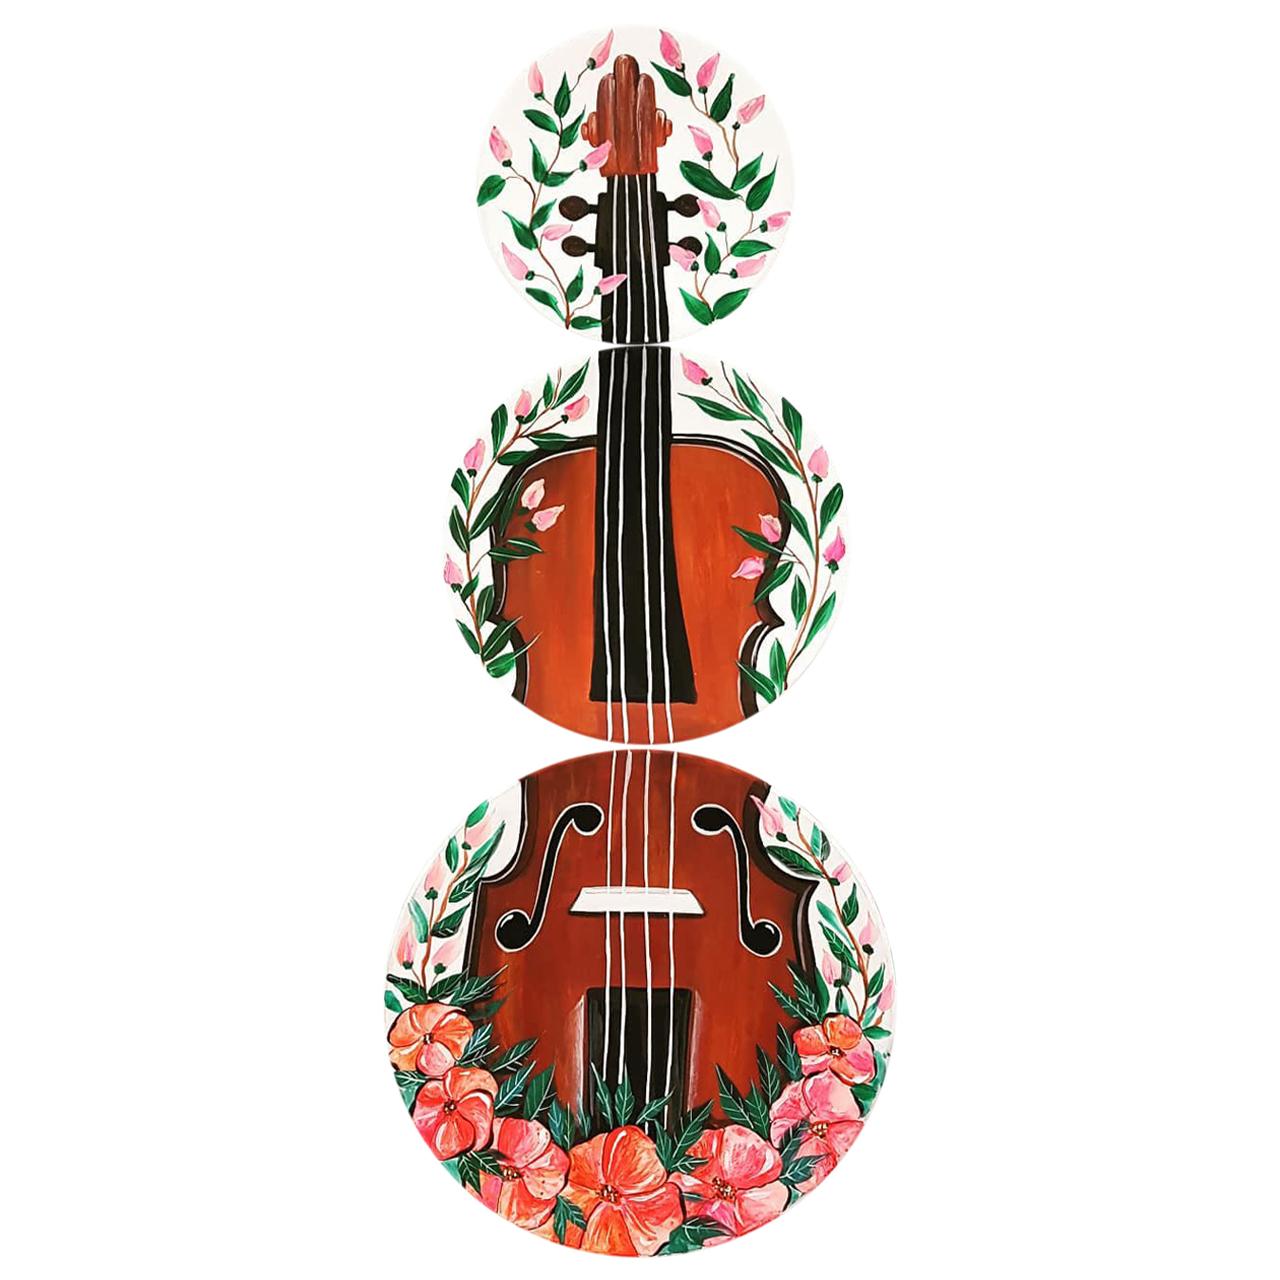 خرید                       بشقاب دیوارکوب سفالی طرح گیتار کد D116-A مجموعه 3 عددی